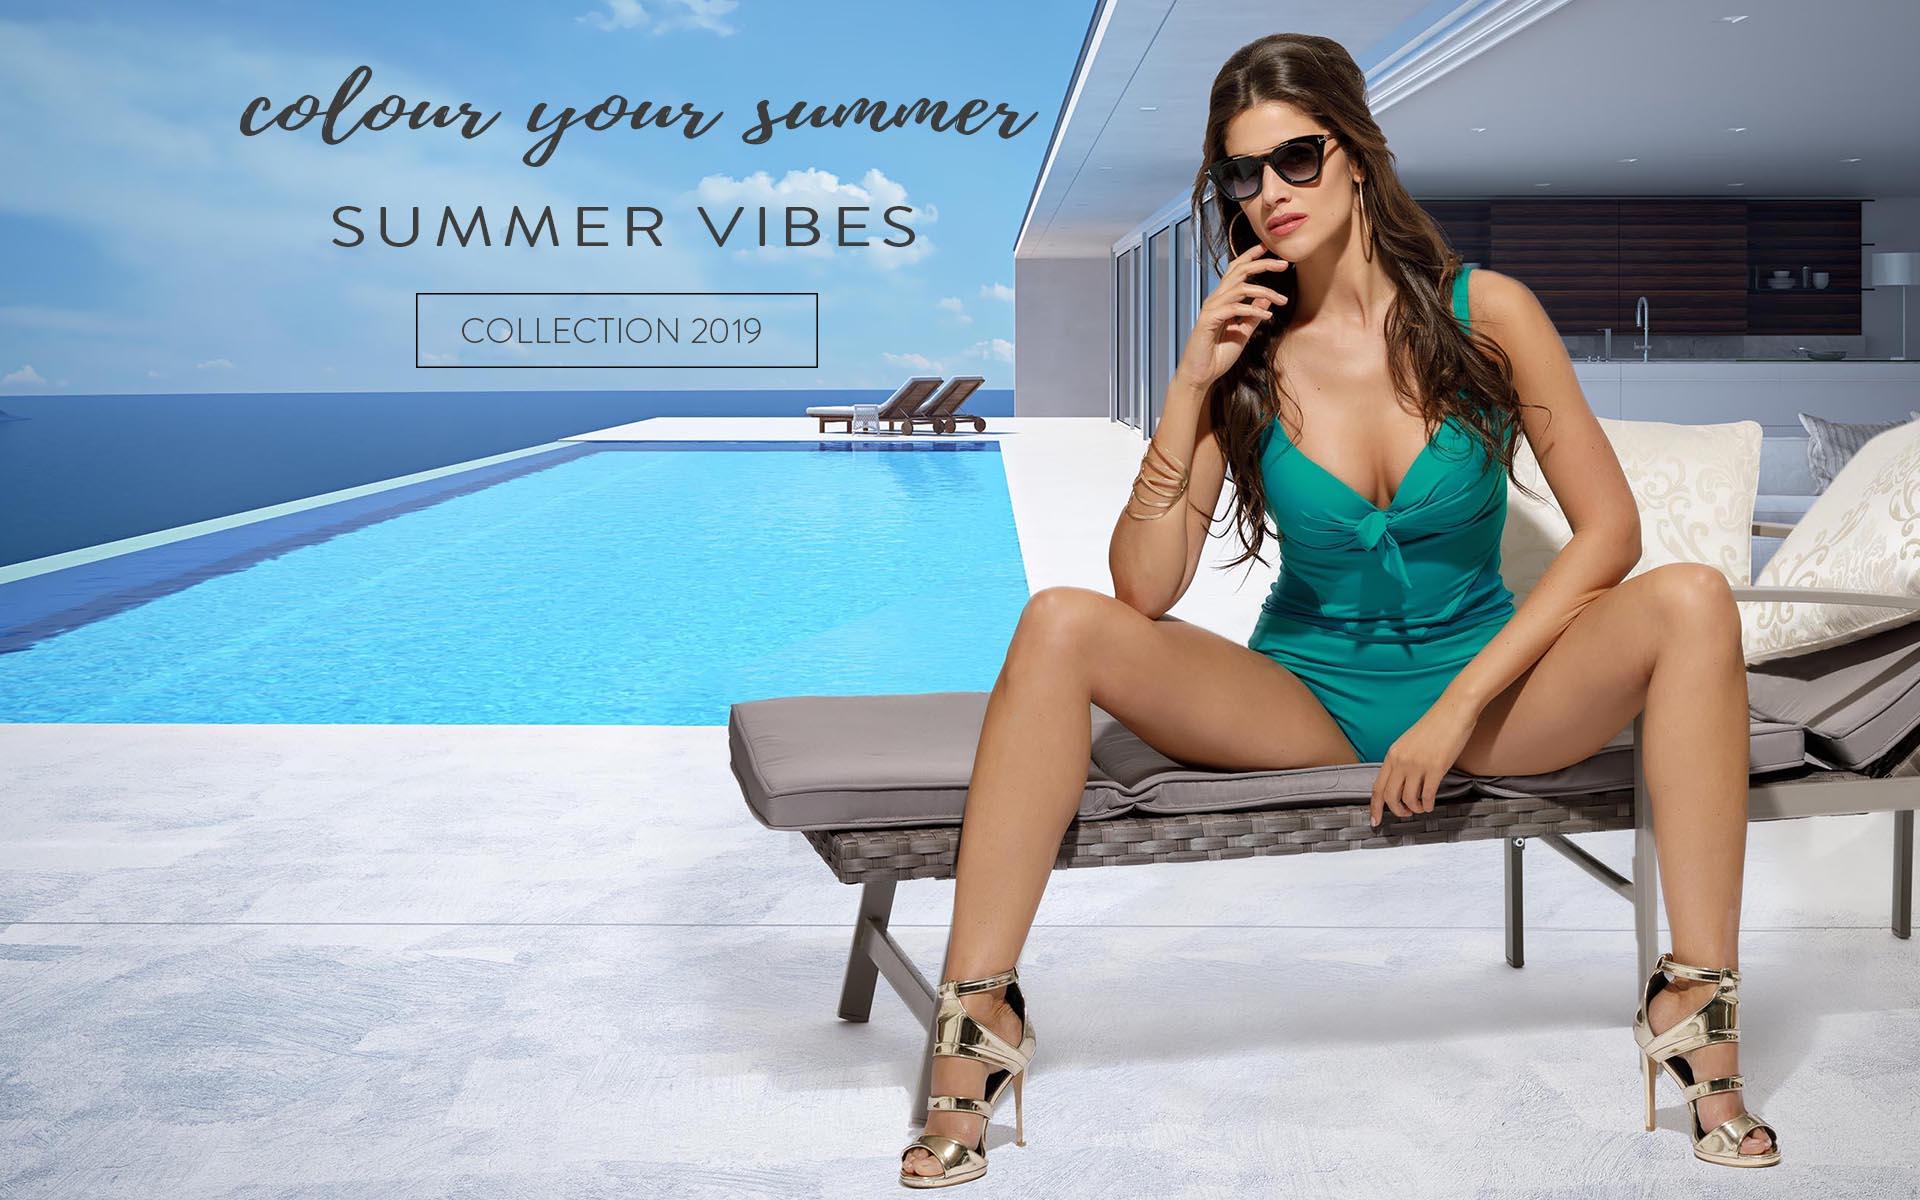 carib-furdoruha-bikini-2019-kollekcio-web-3n